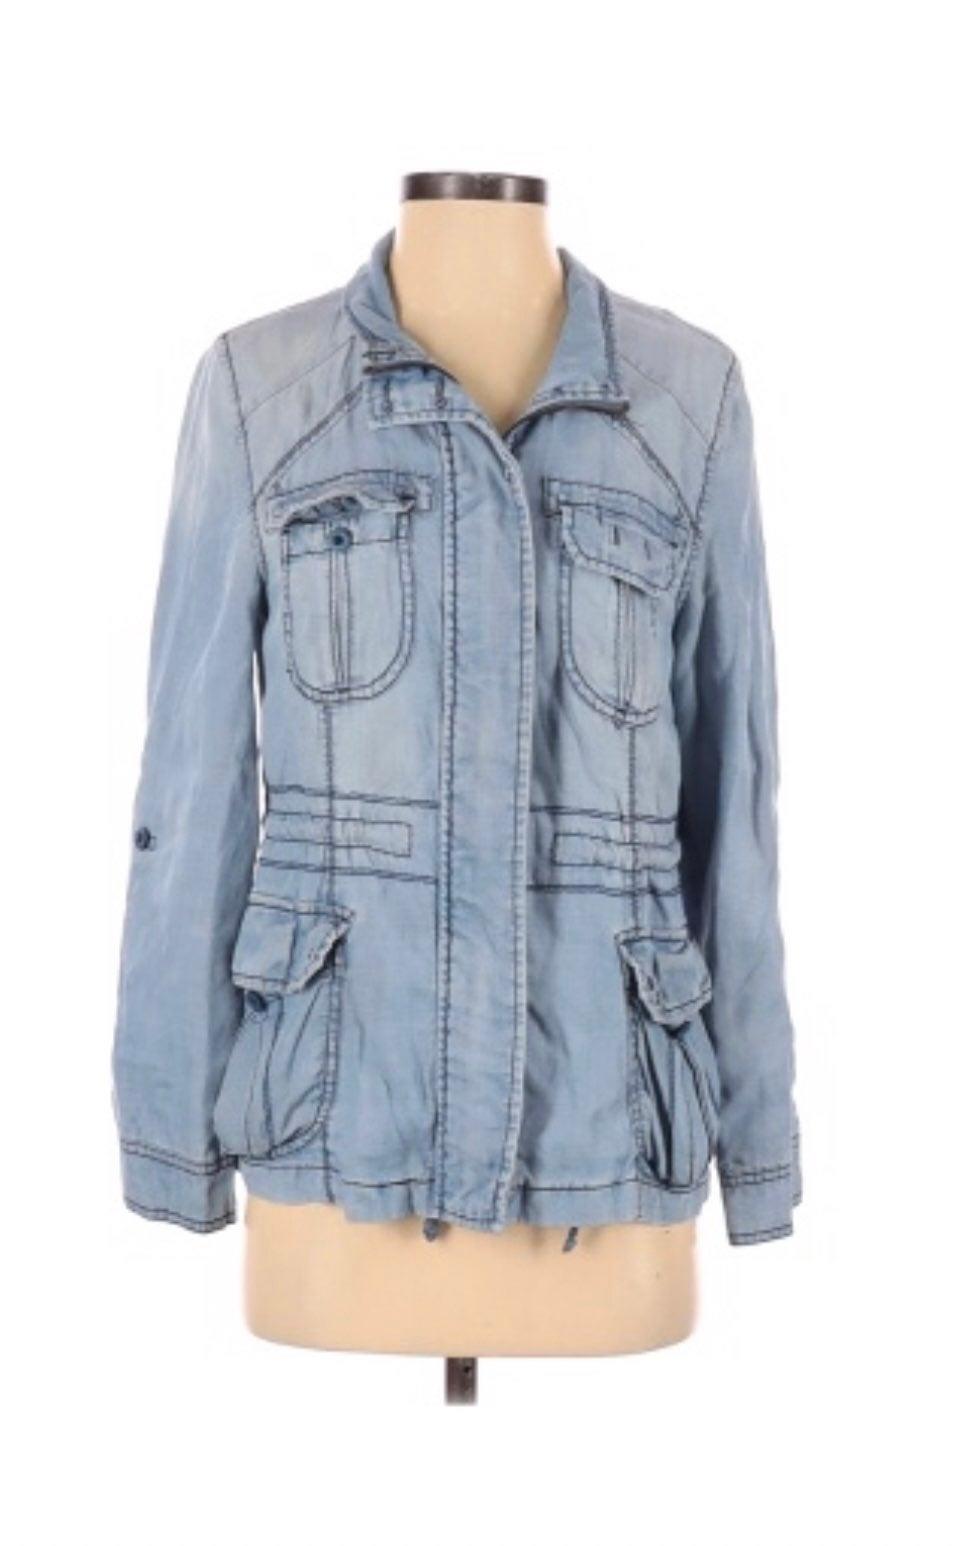 Marrakech denim jacket